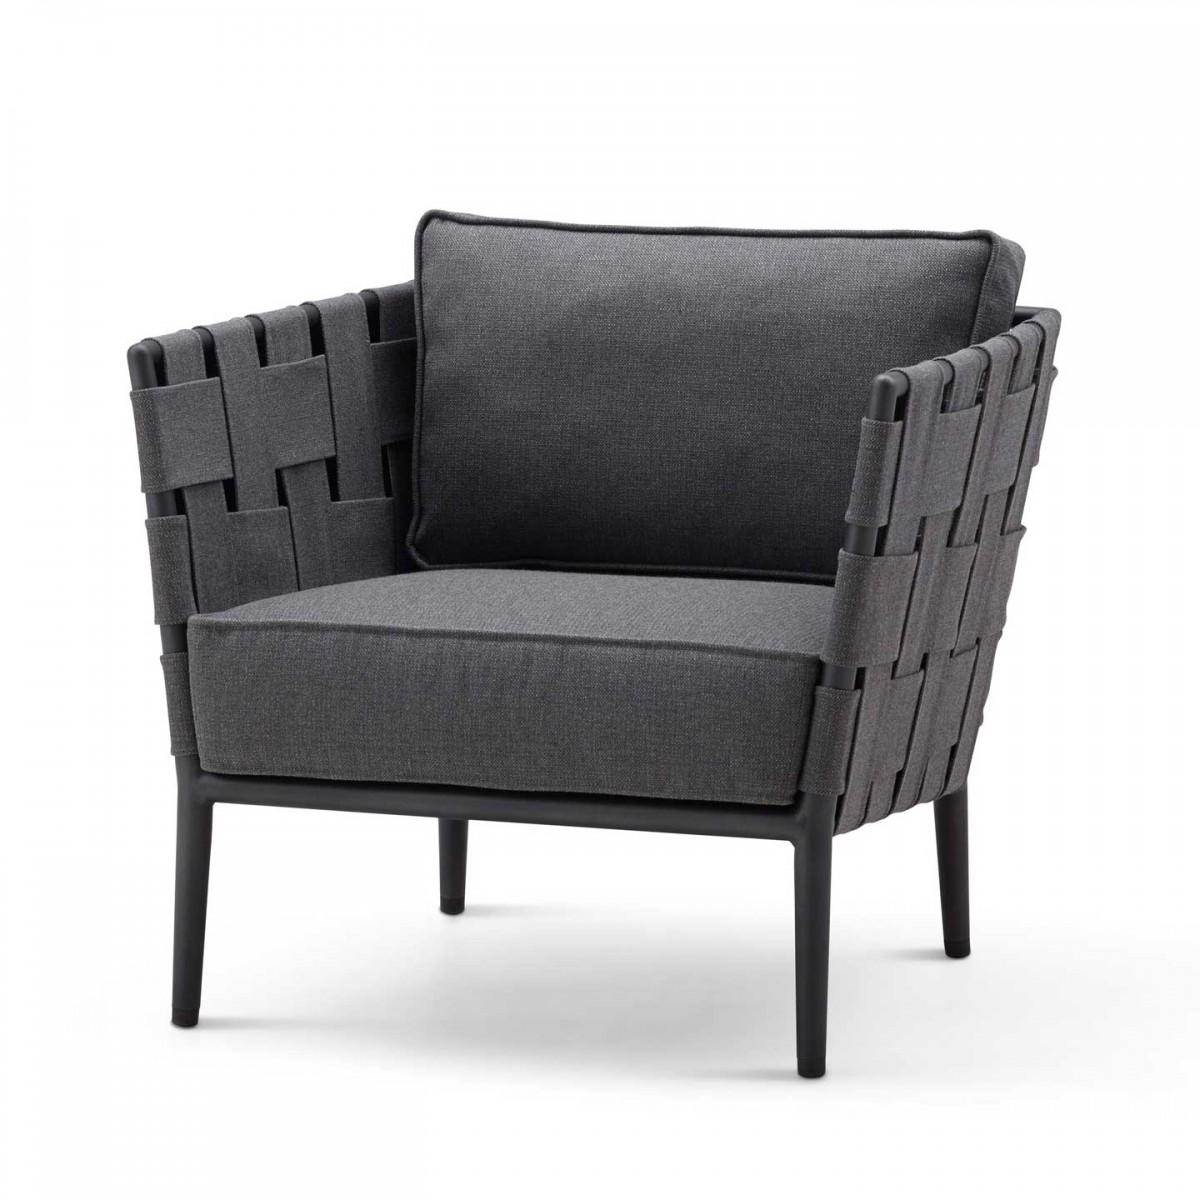 lounge angle patio club teak outdoor furniture chair chairs warehouse rope bianca